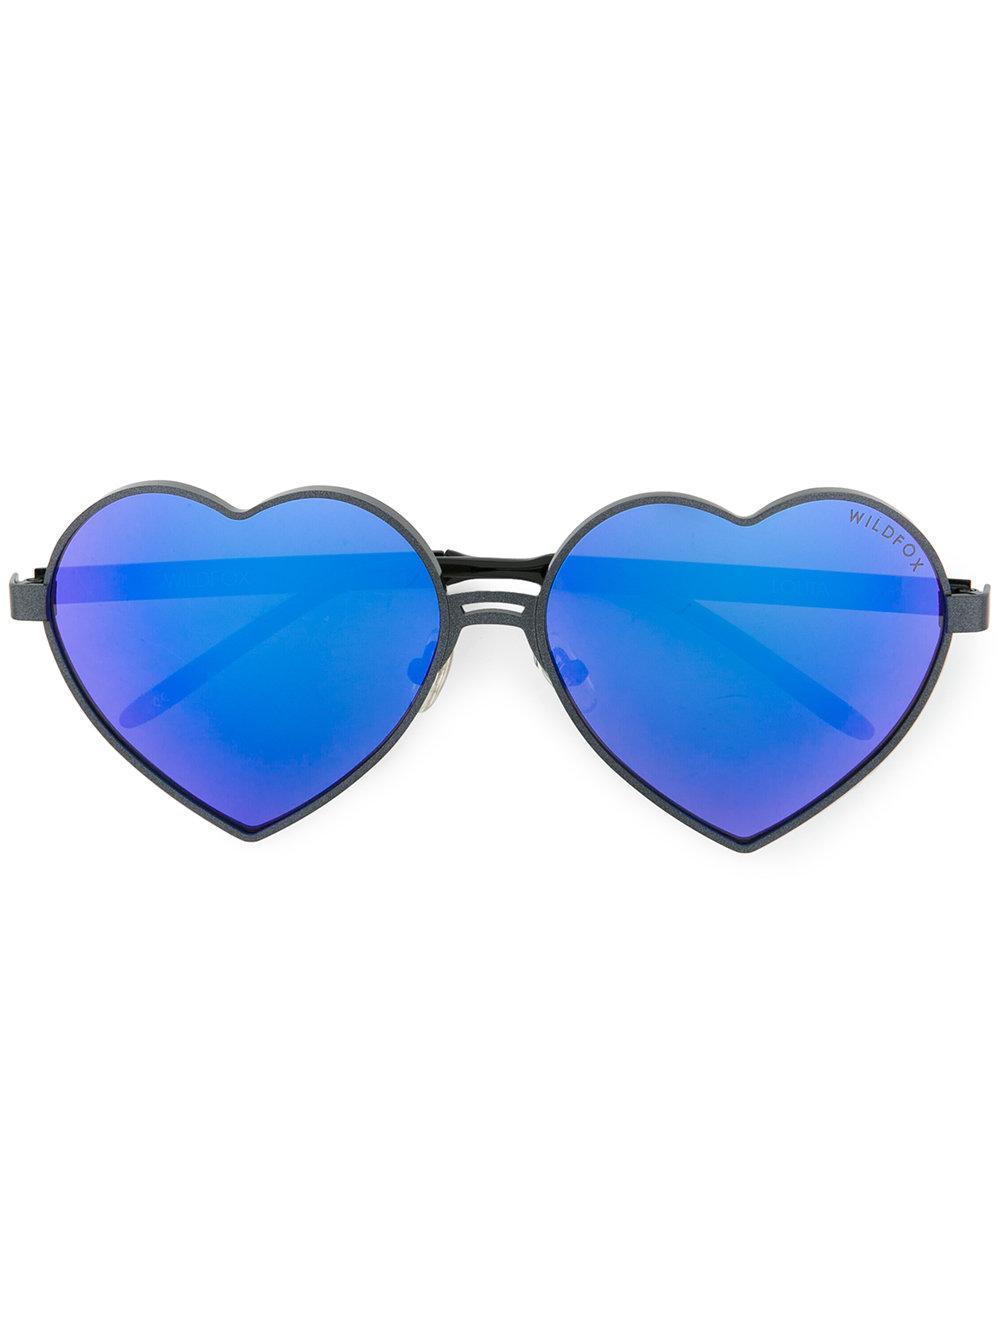 Wildfox Heart Shaped Sunglasses